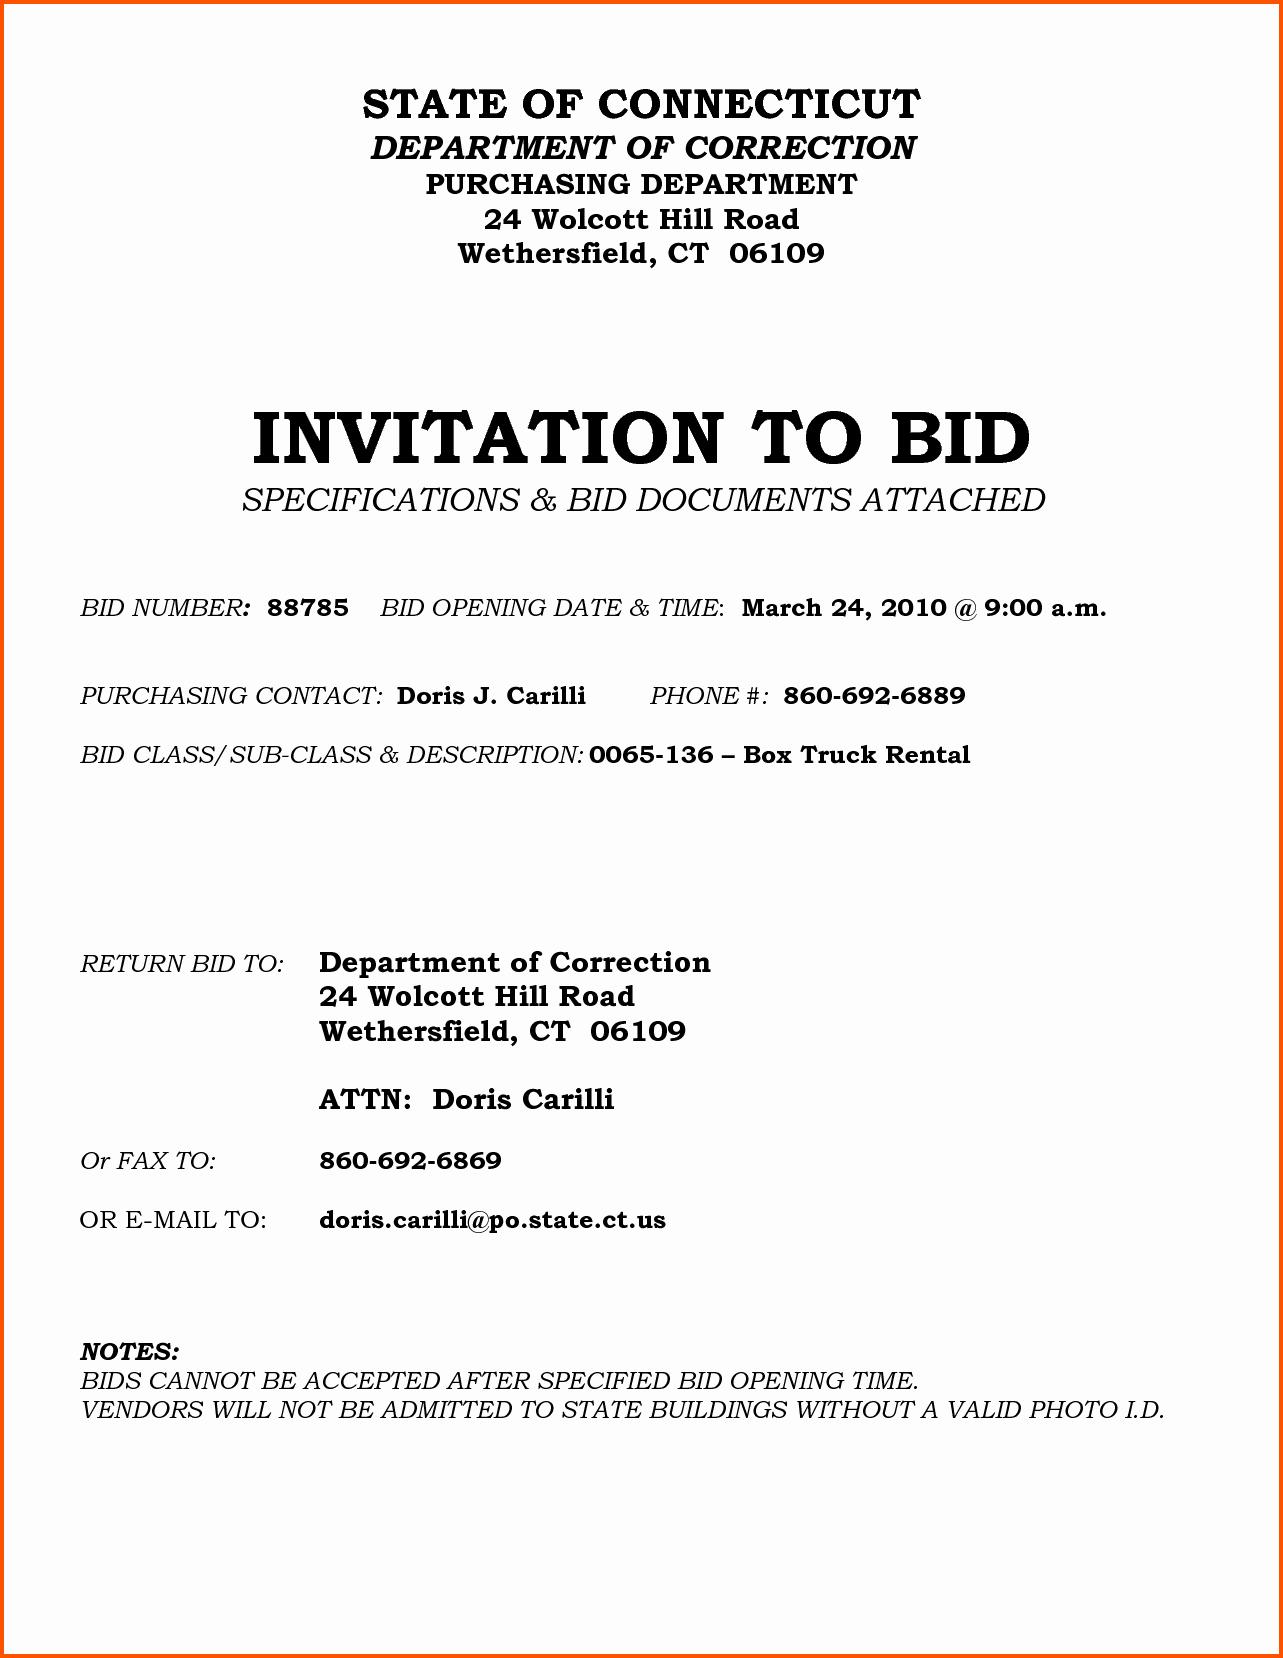 Invitation to Bid Template Construction New Invitation to Bid Construction Template Gallery Template